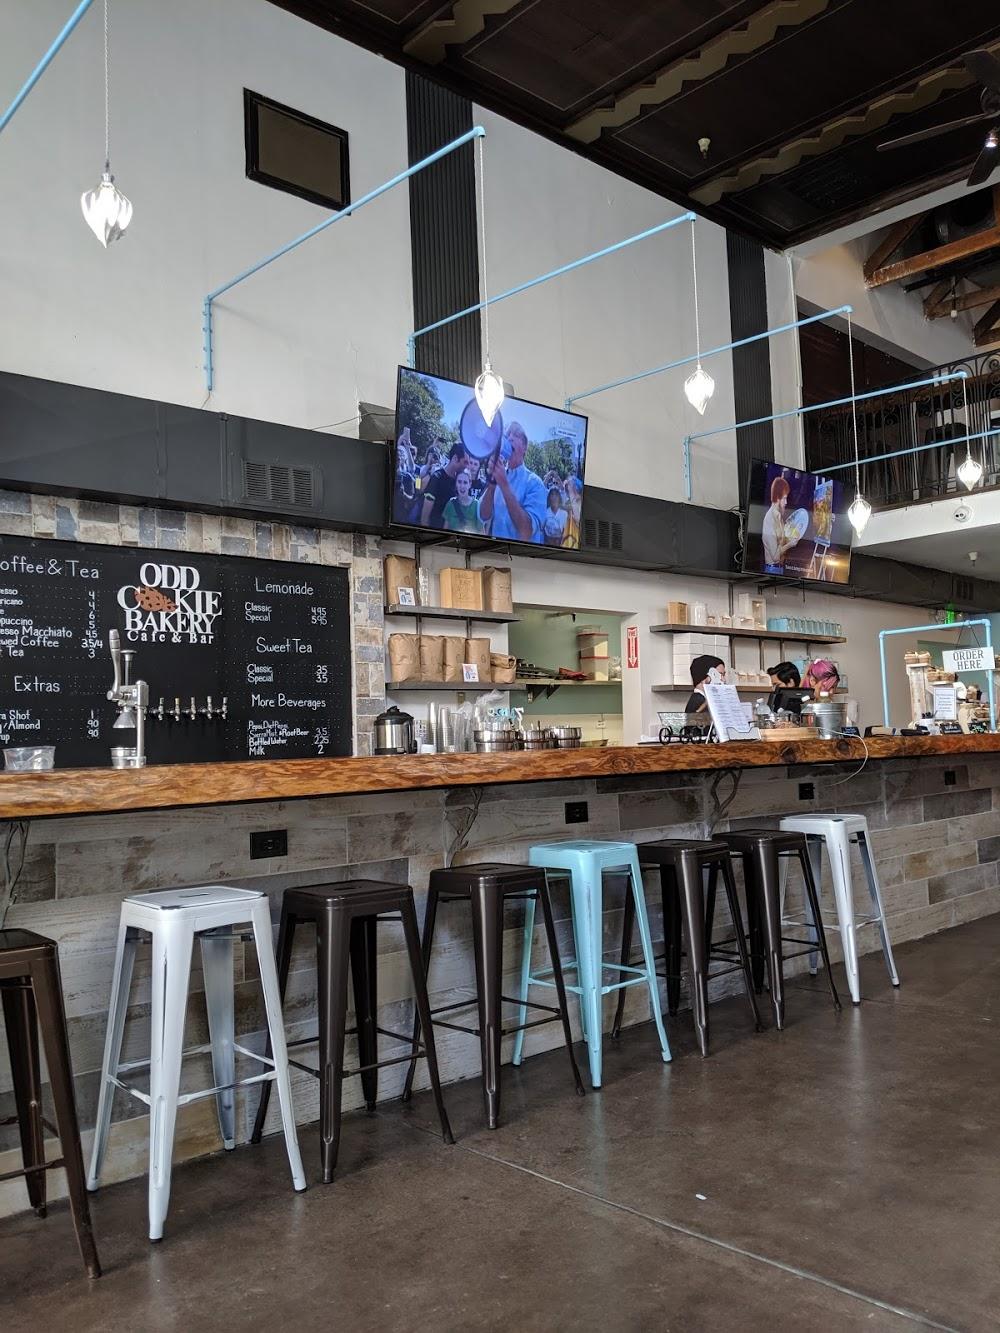 Odd Cookie Bakery Cafe & Bar